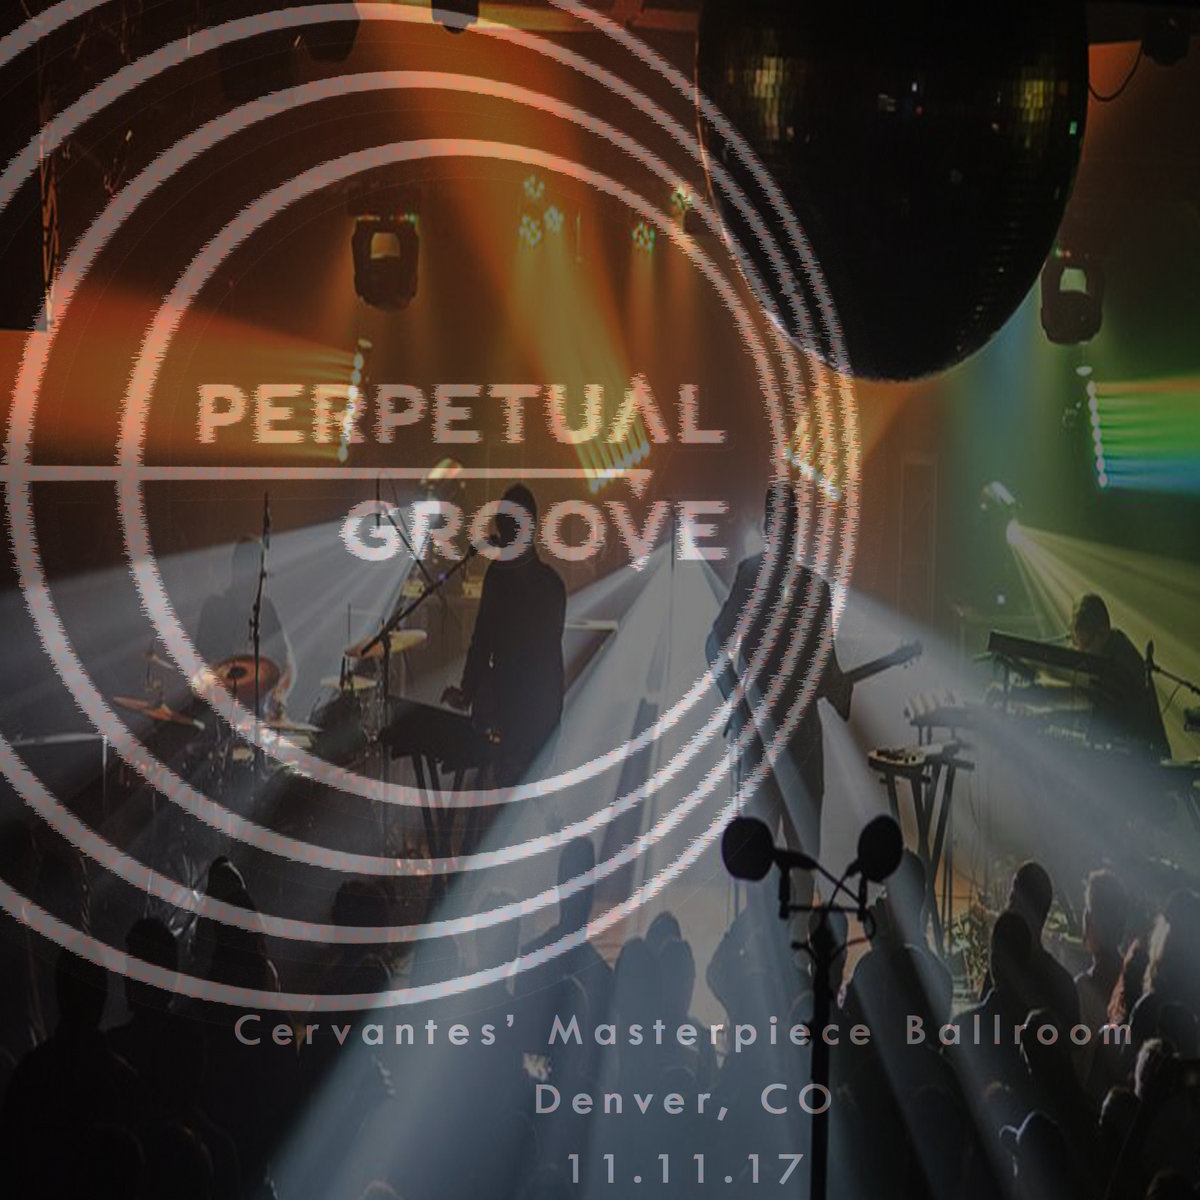 Music | Perpetual Groove